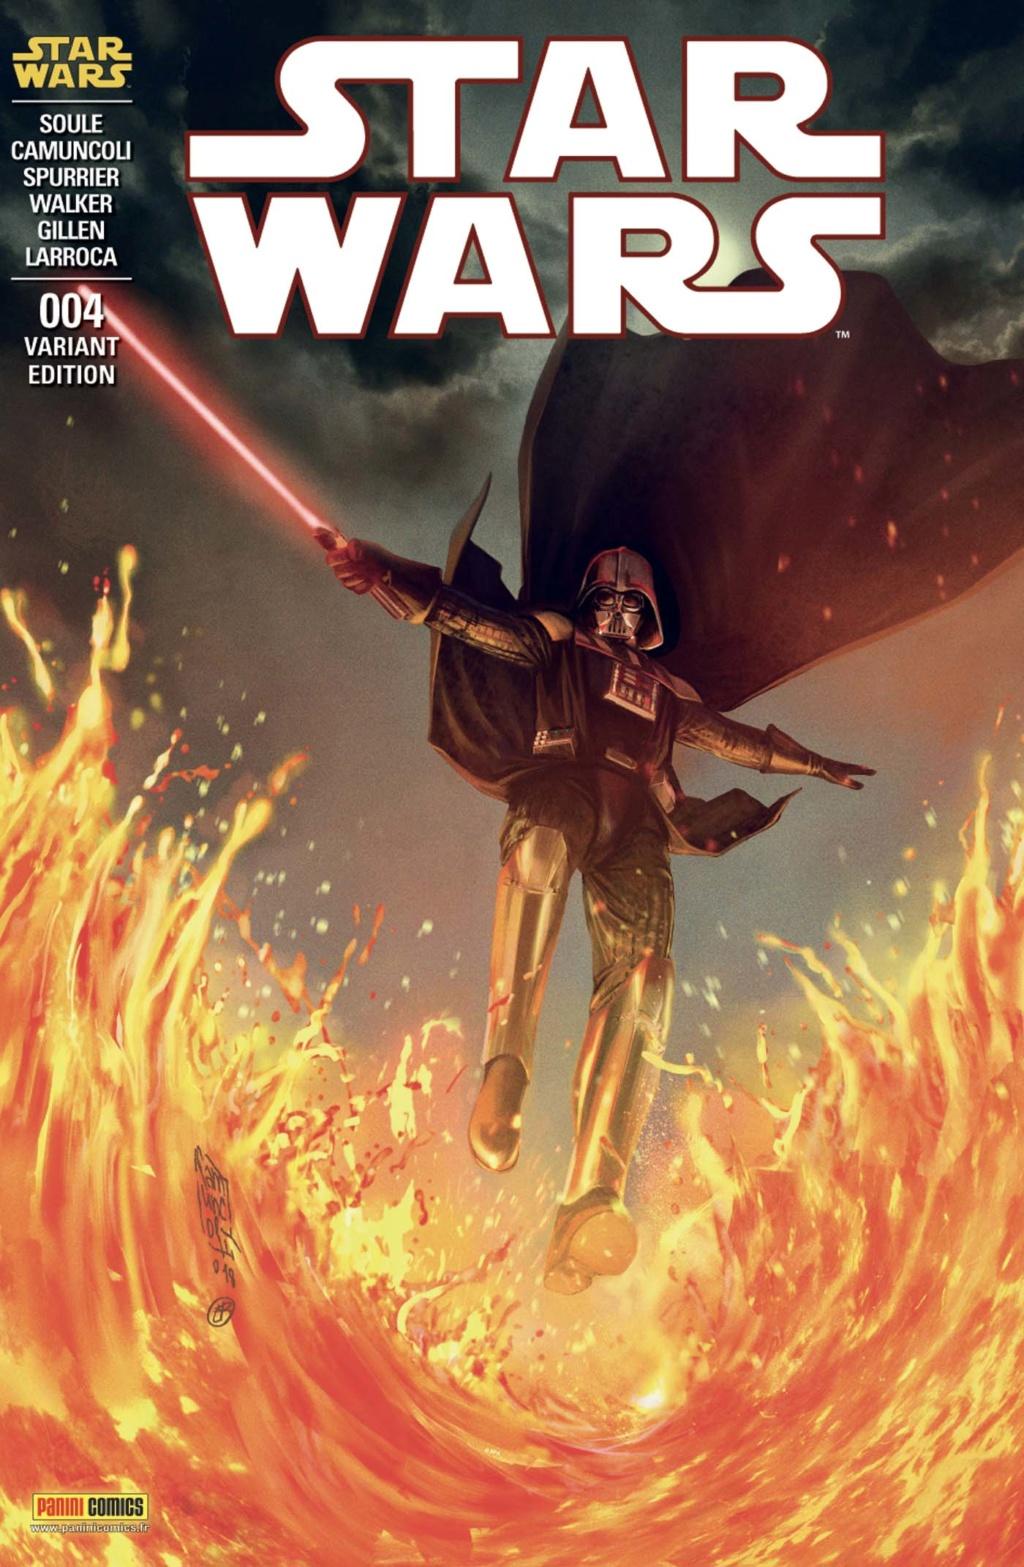 MAGAZINE STAR WARS #04 V3 (29) PANINI - Juillet 2019  97828017